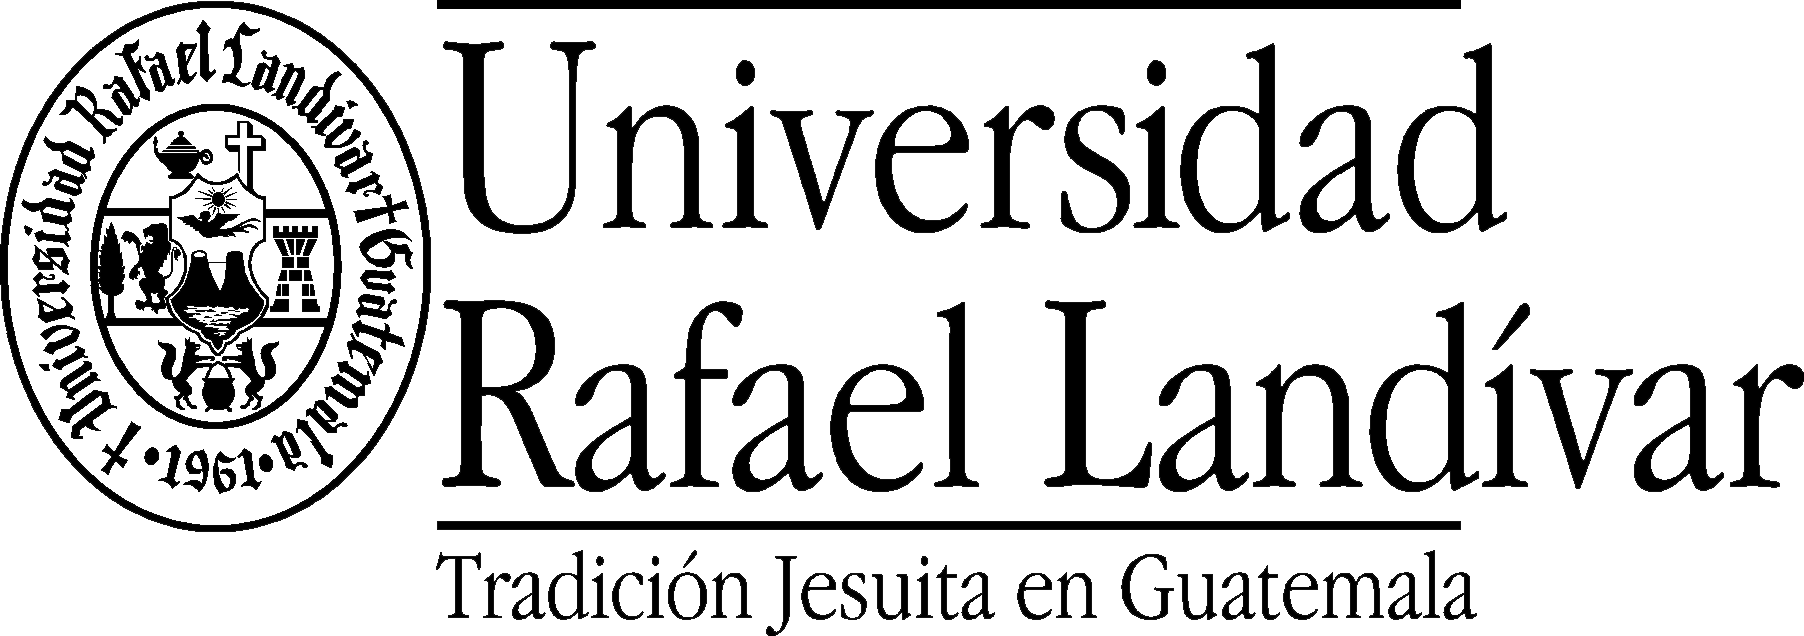 image logo url